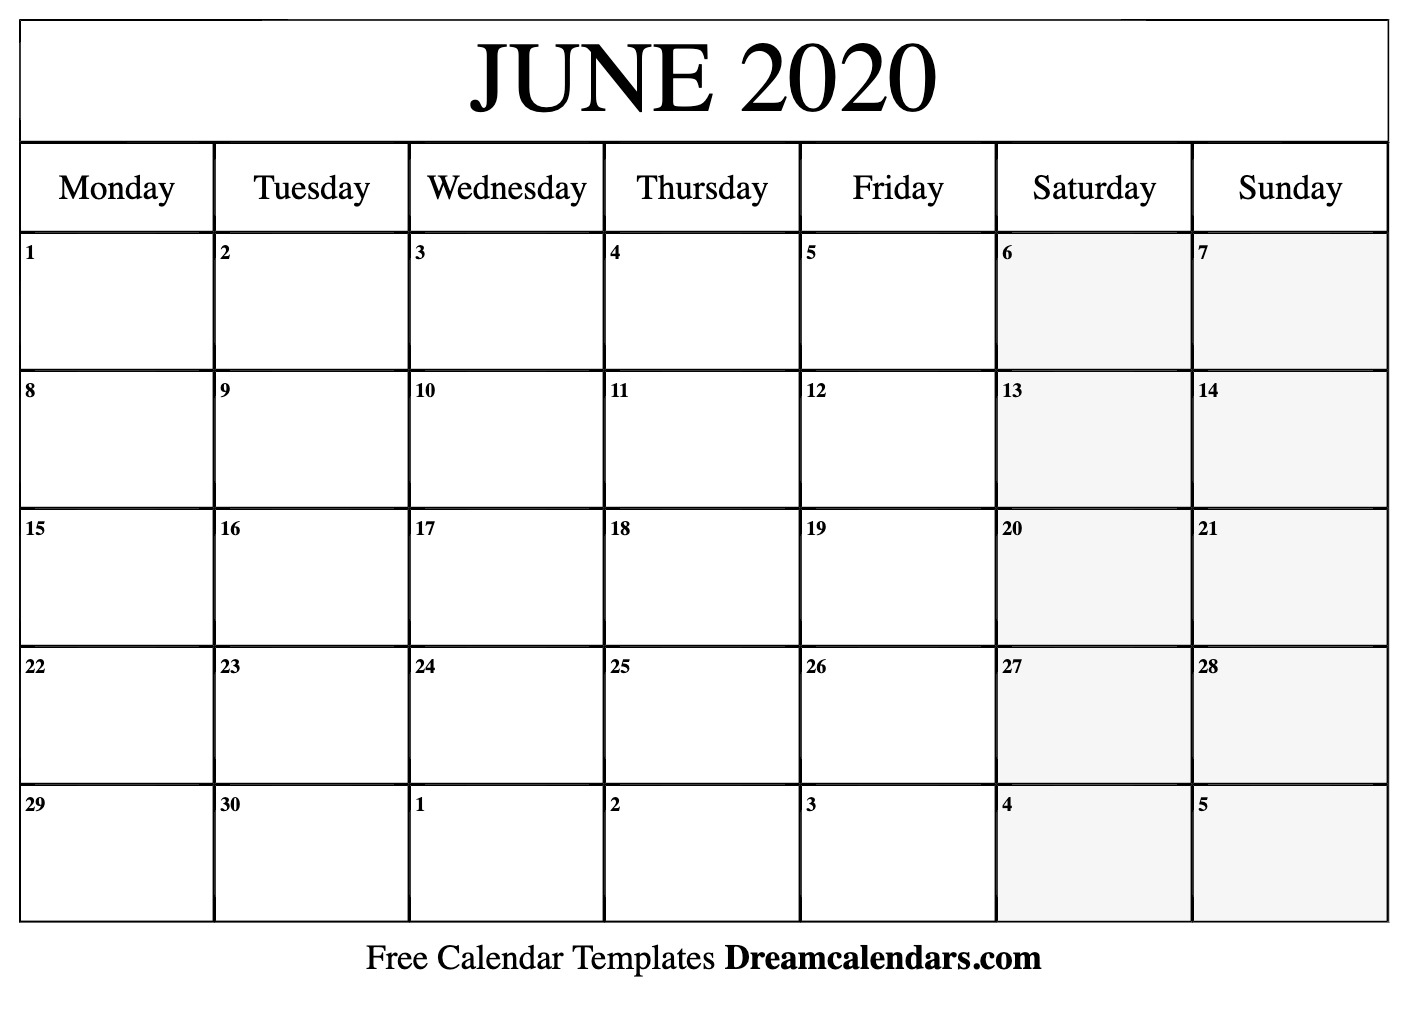 Free June 2020 Printable Calendar | Dream Calendars